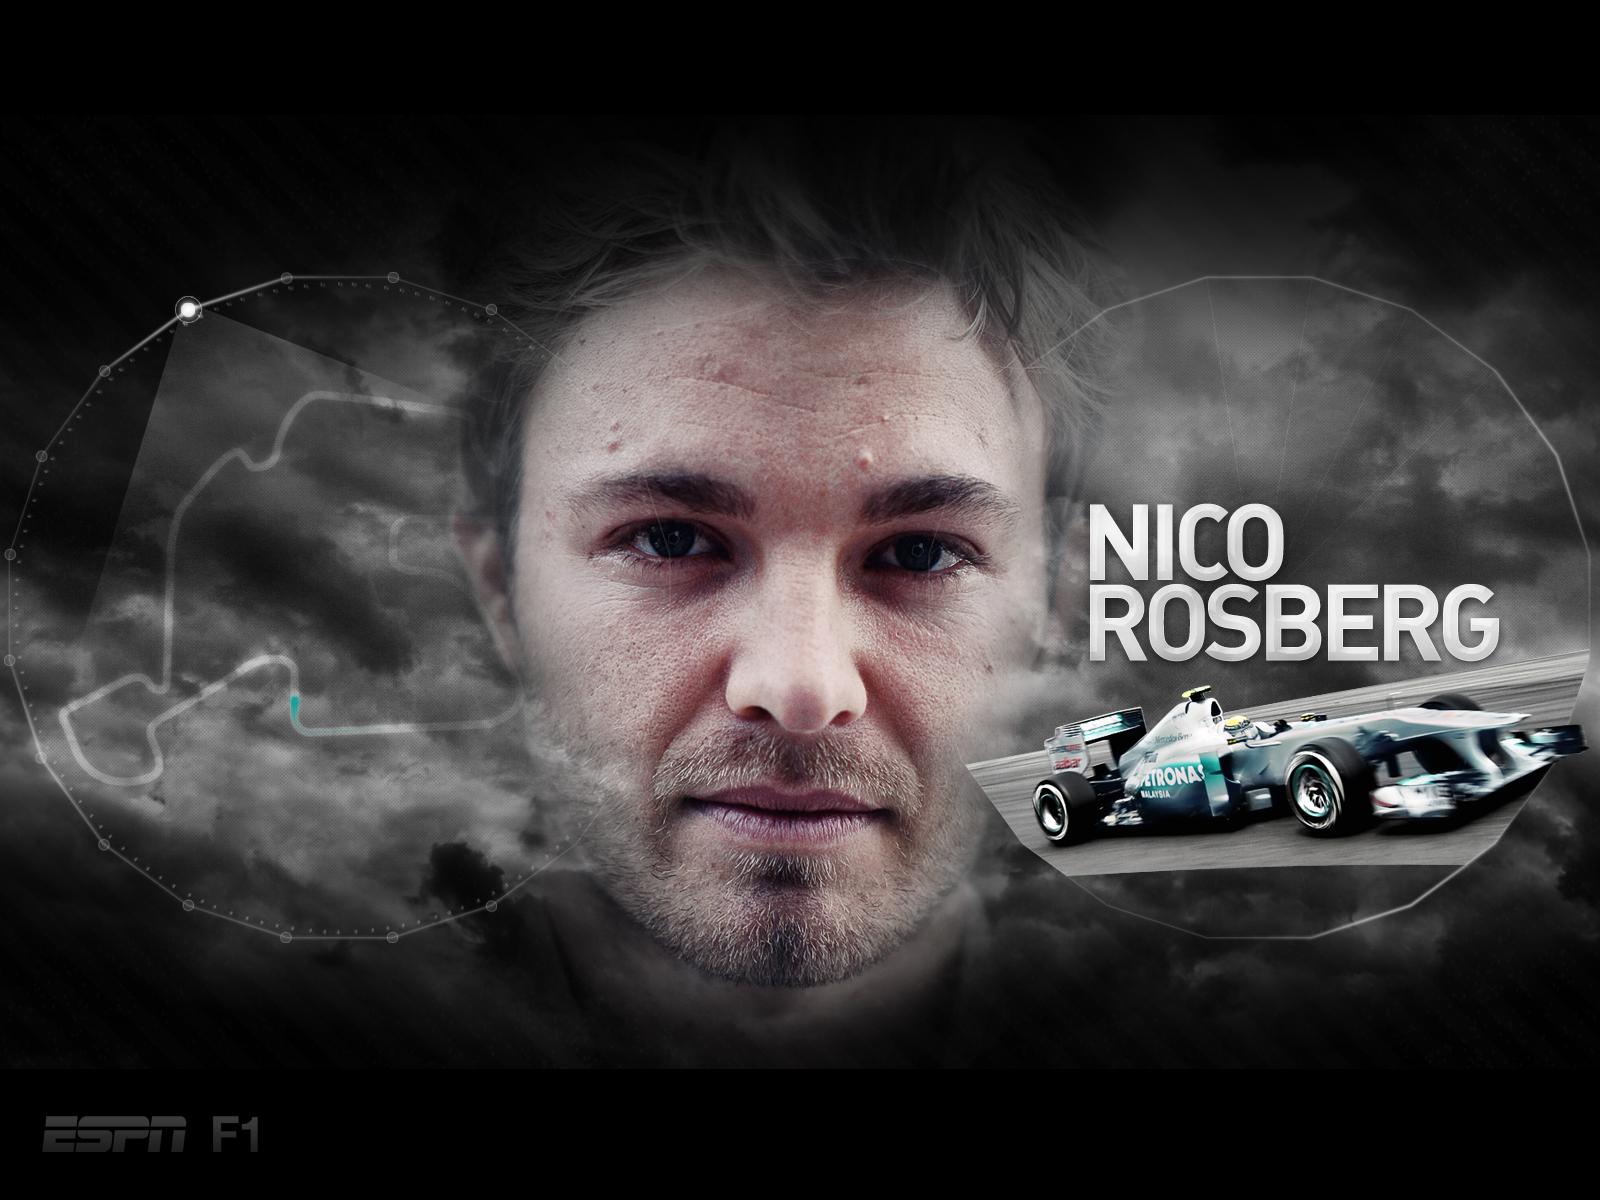 Nico Rosberg 2011